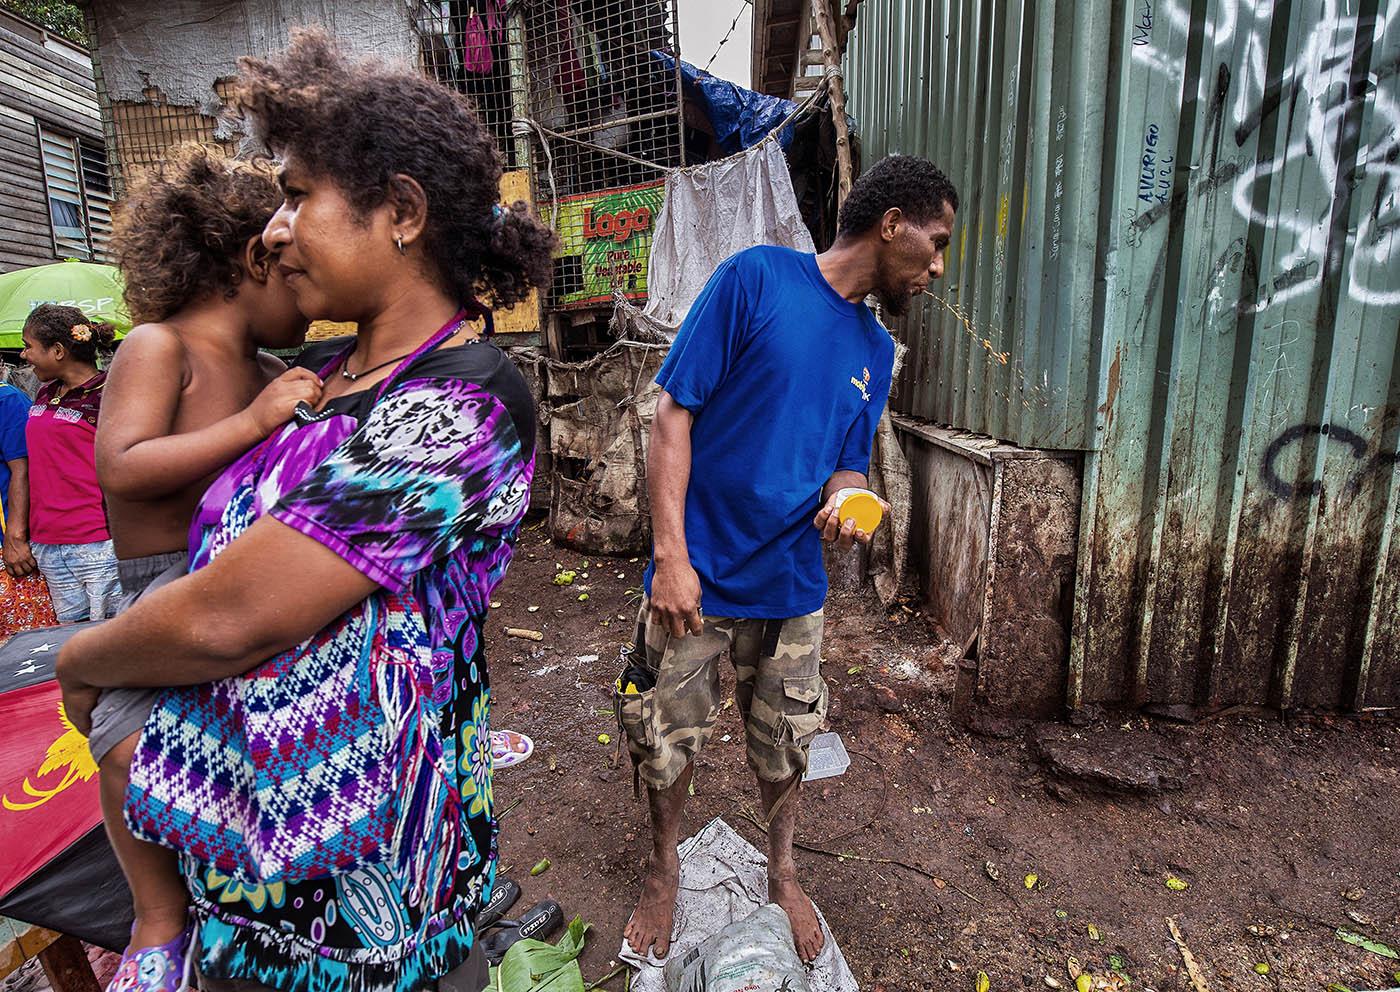 A man spits betel nut (buai) at Hanuabada market.  © Brian Cassey